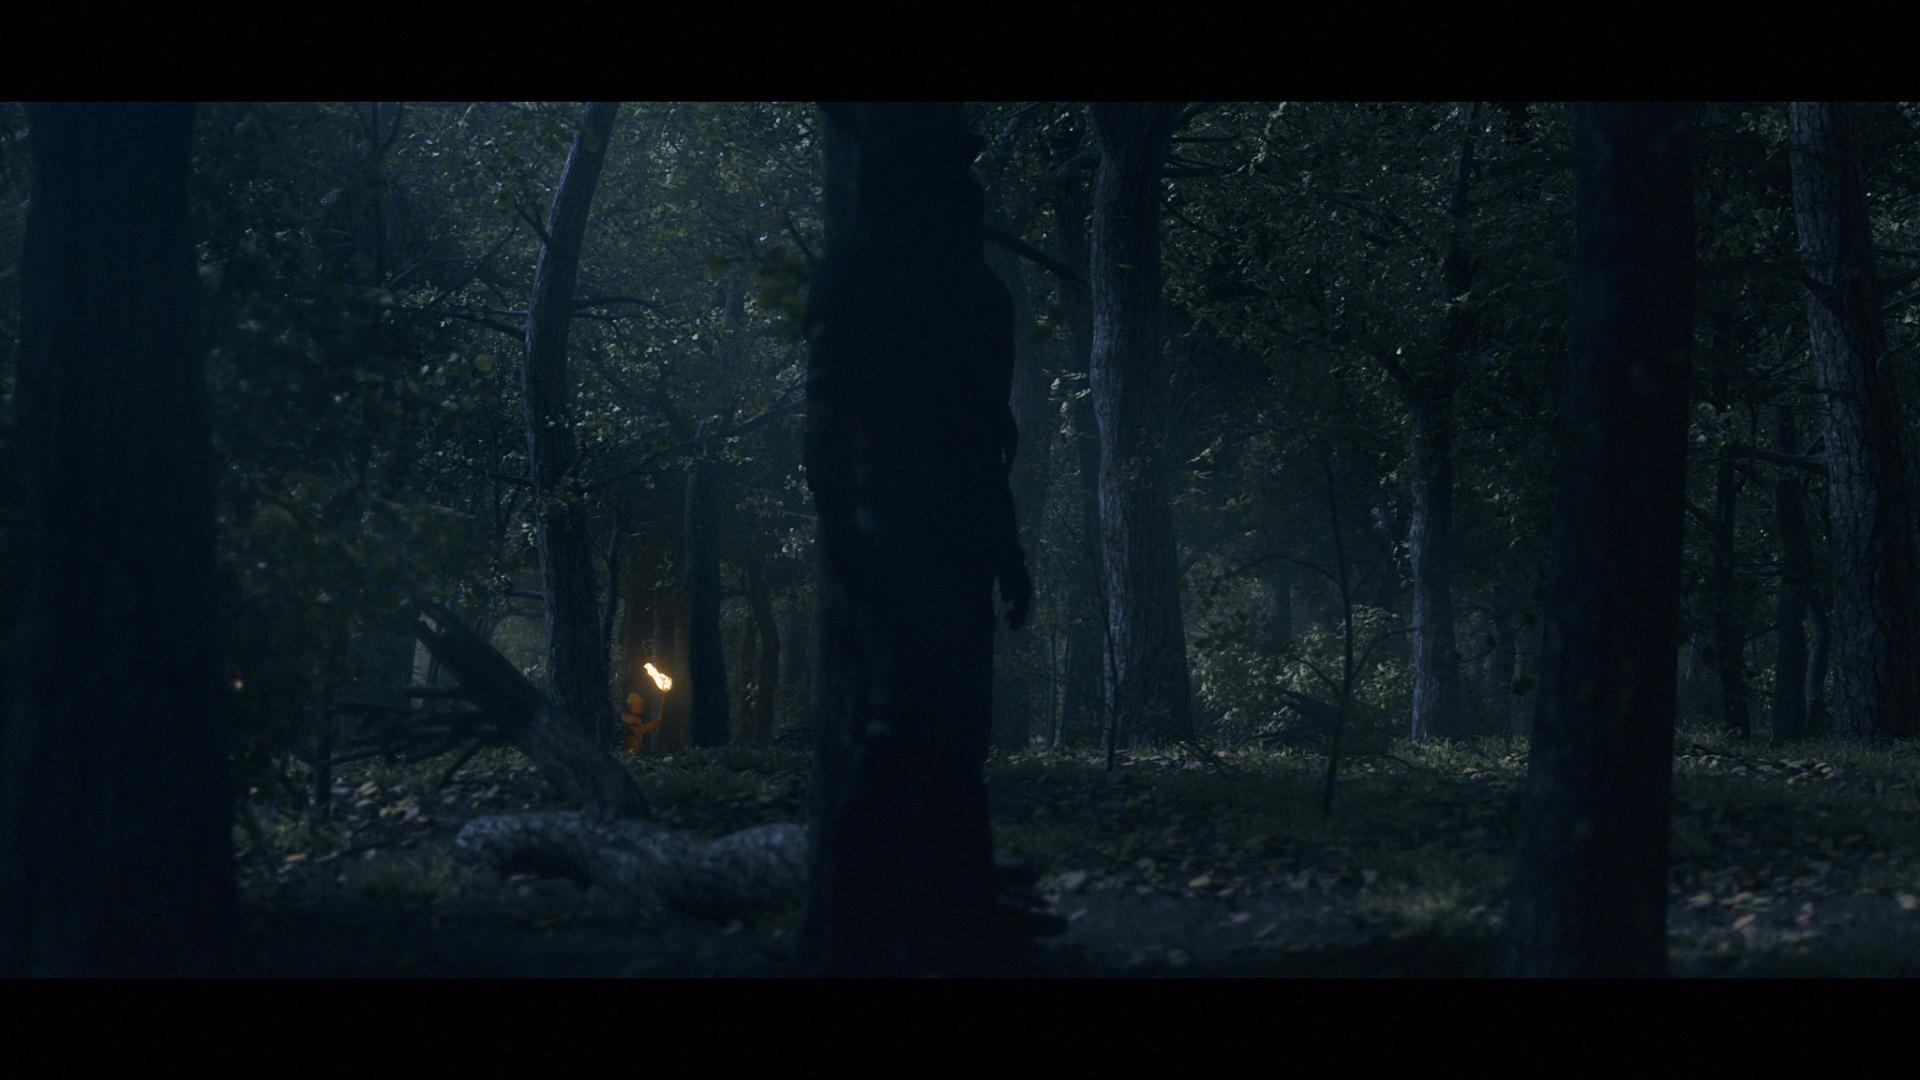 3d-animation-studio-hungary-project-battle-of-debrecen-2